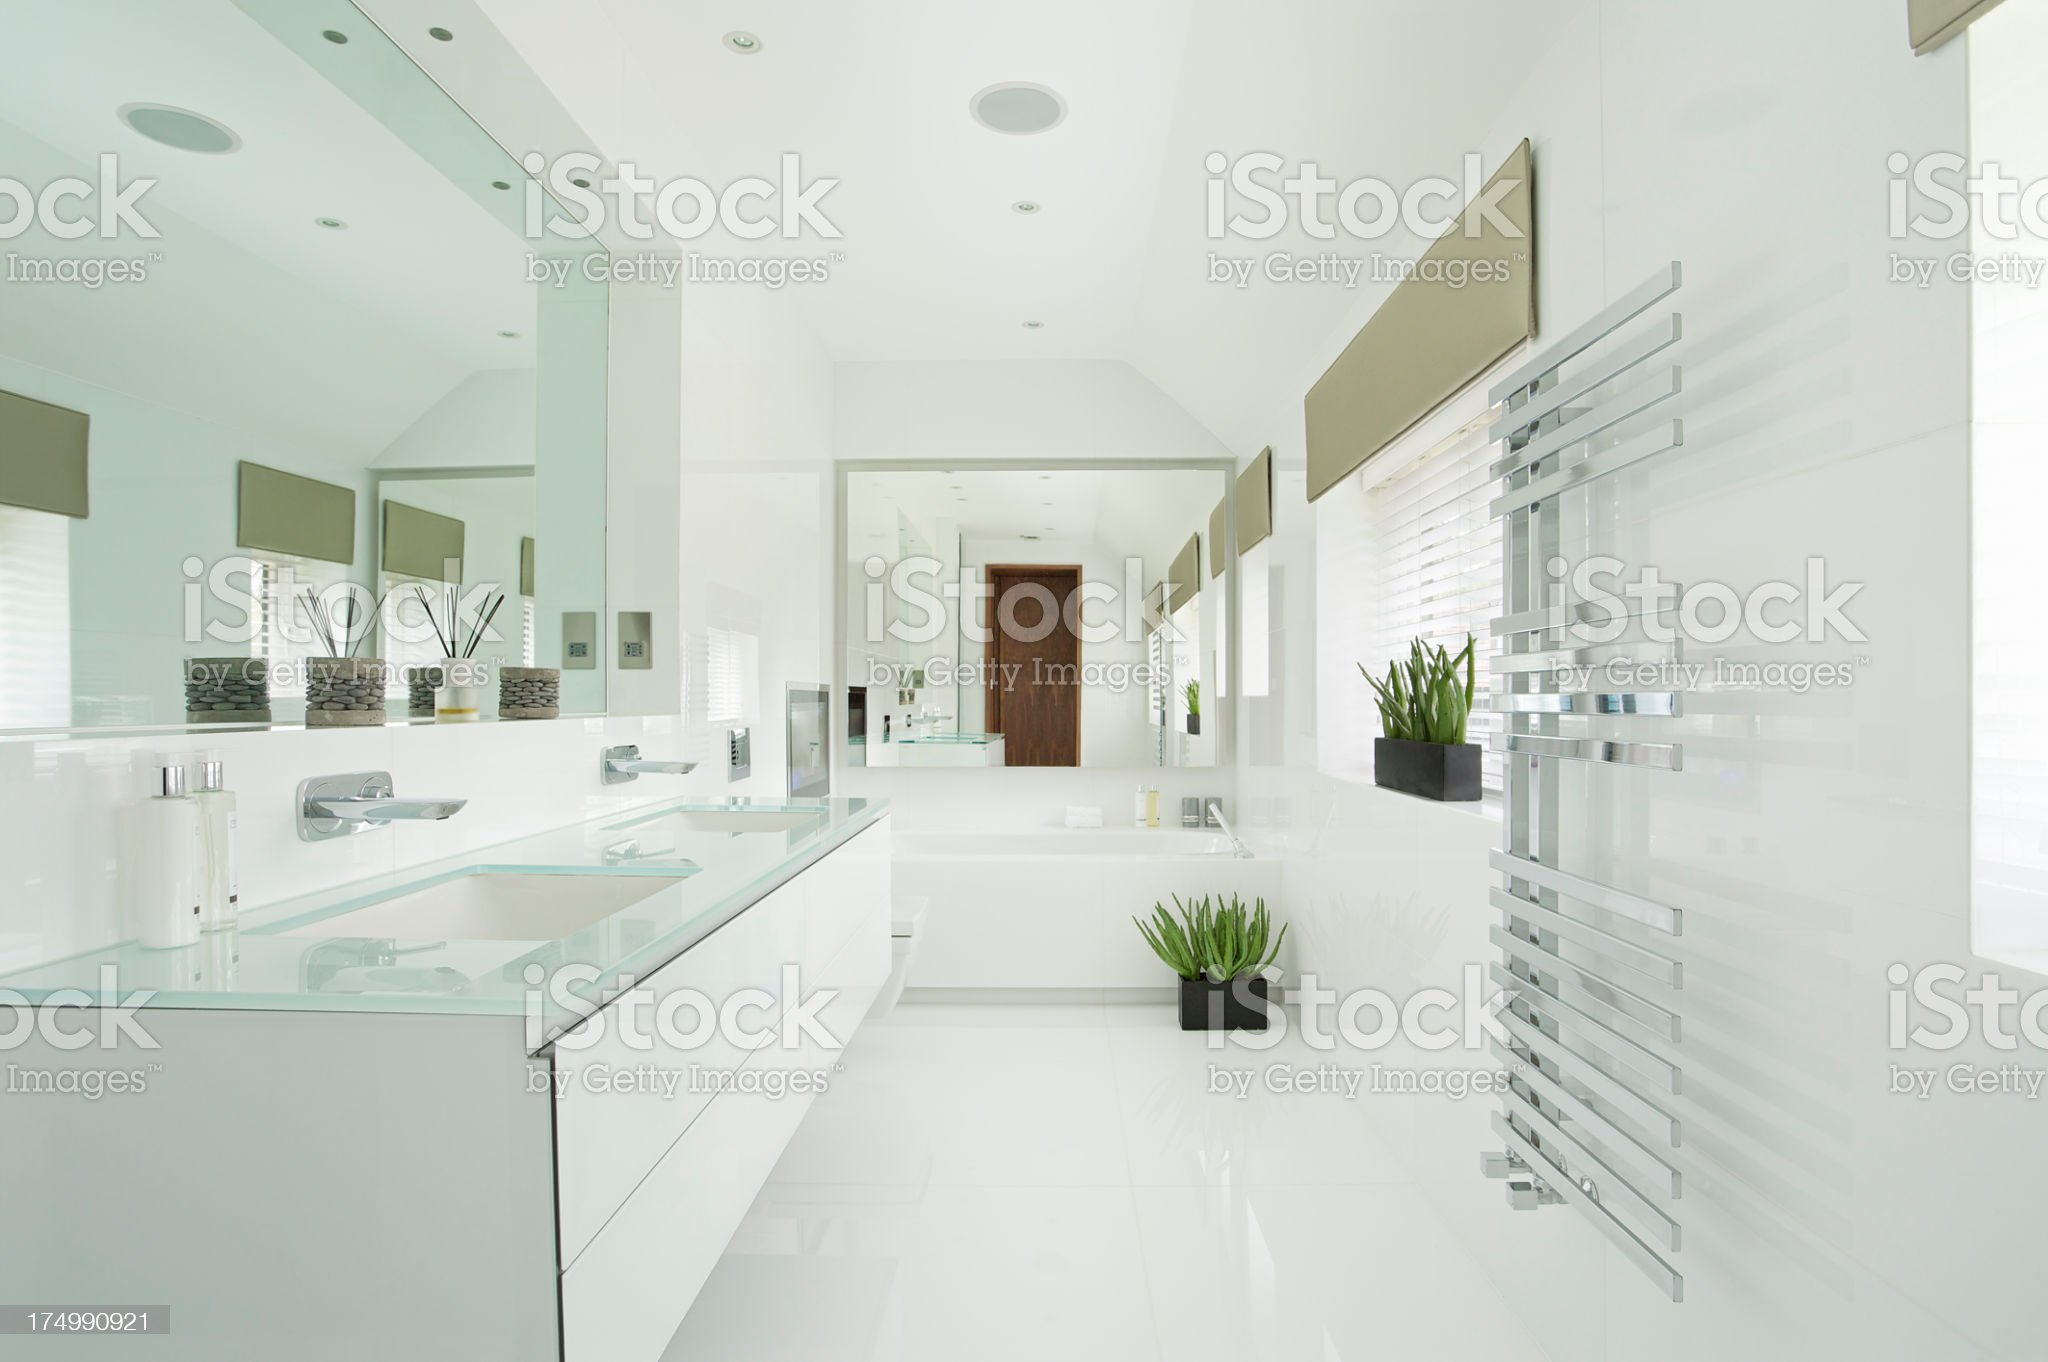 Modern interior design of white bright bathroom royalty-free stock photo